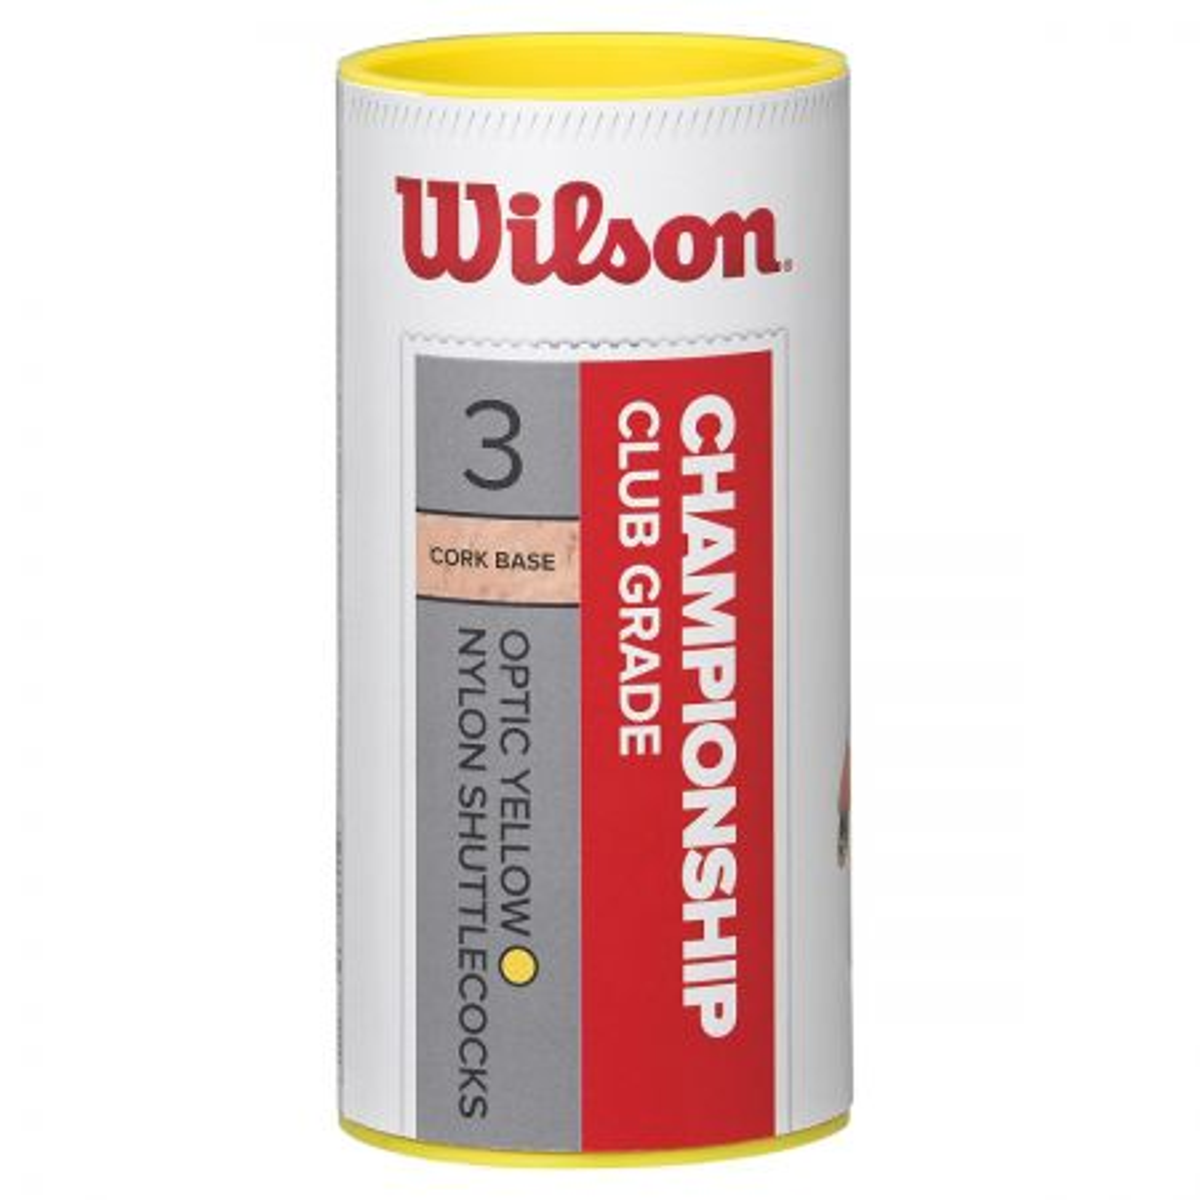 Wilson 1/3 Championship 3 tube loptice